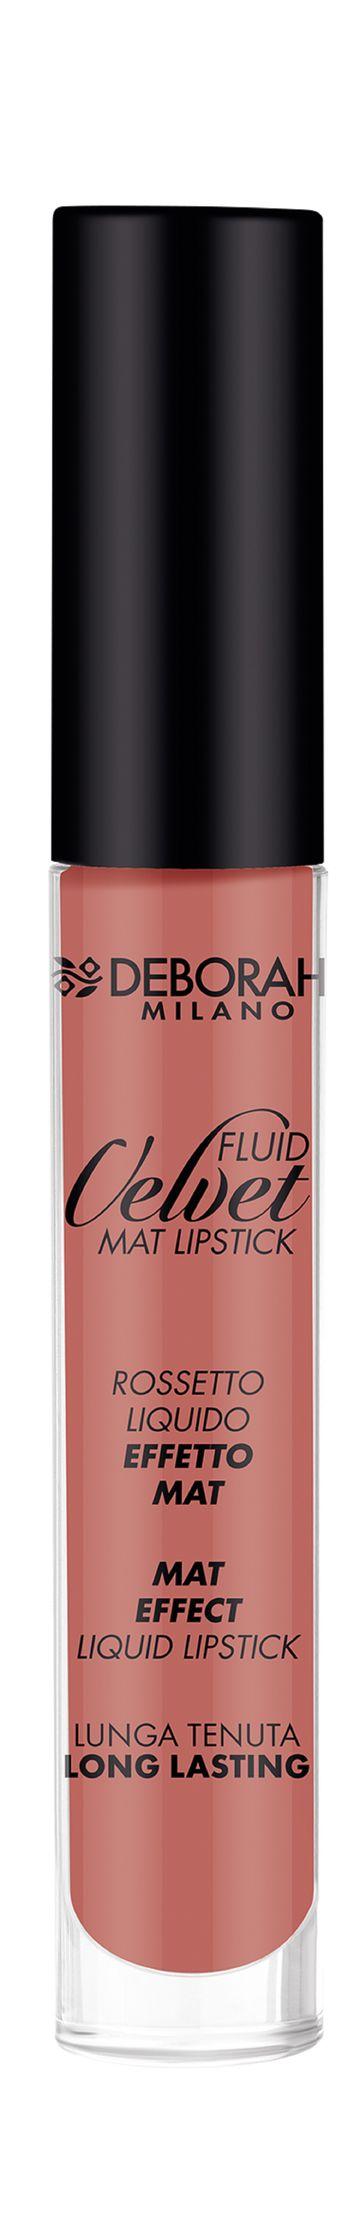 Deborah Milano | Fluid Velvet Mat - 1 Antique Rose